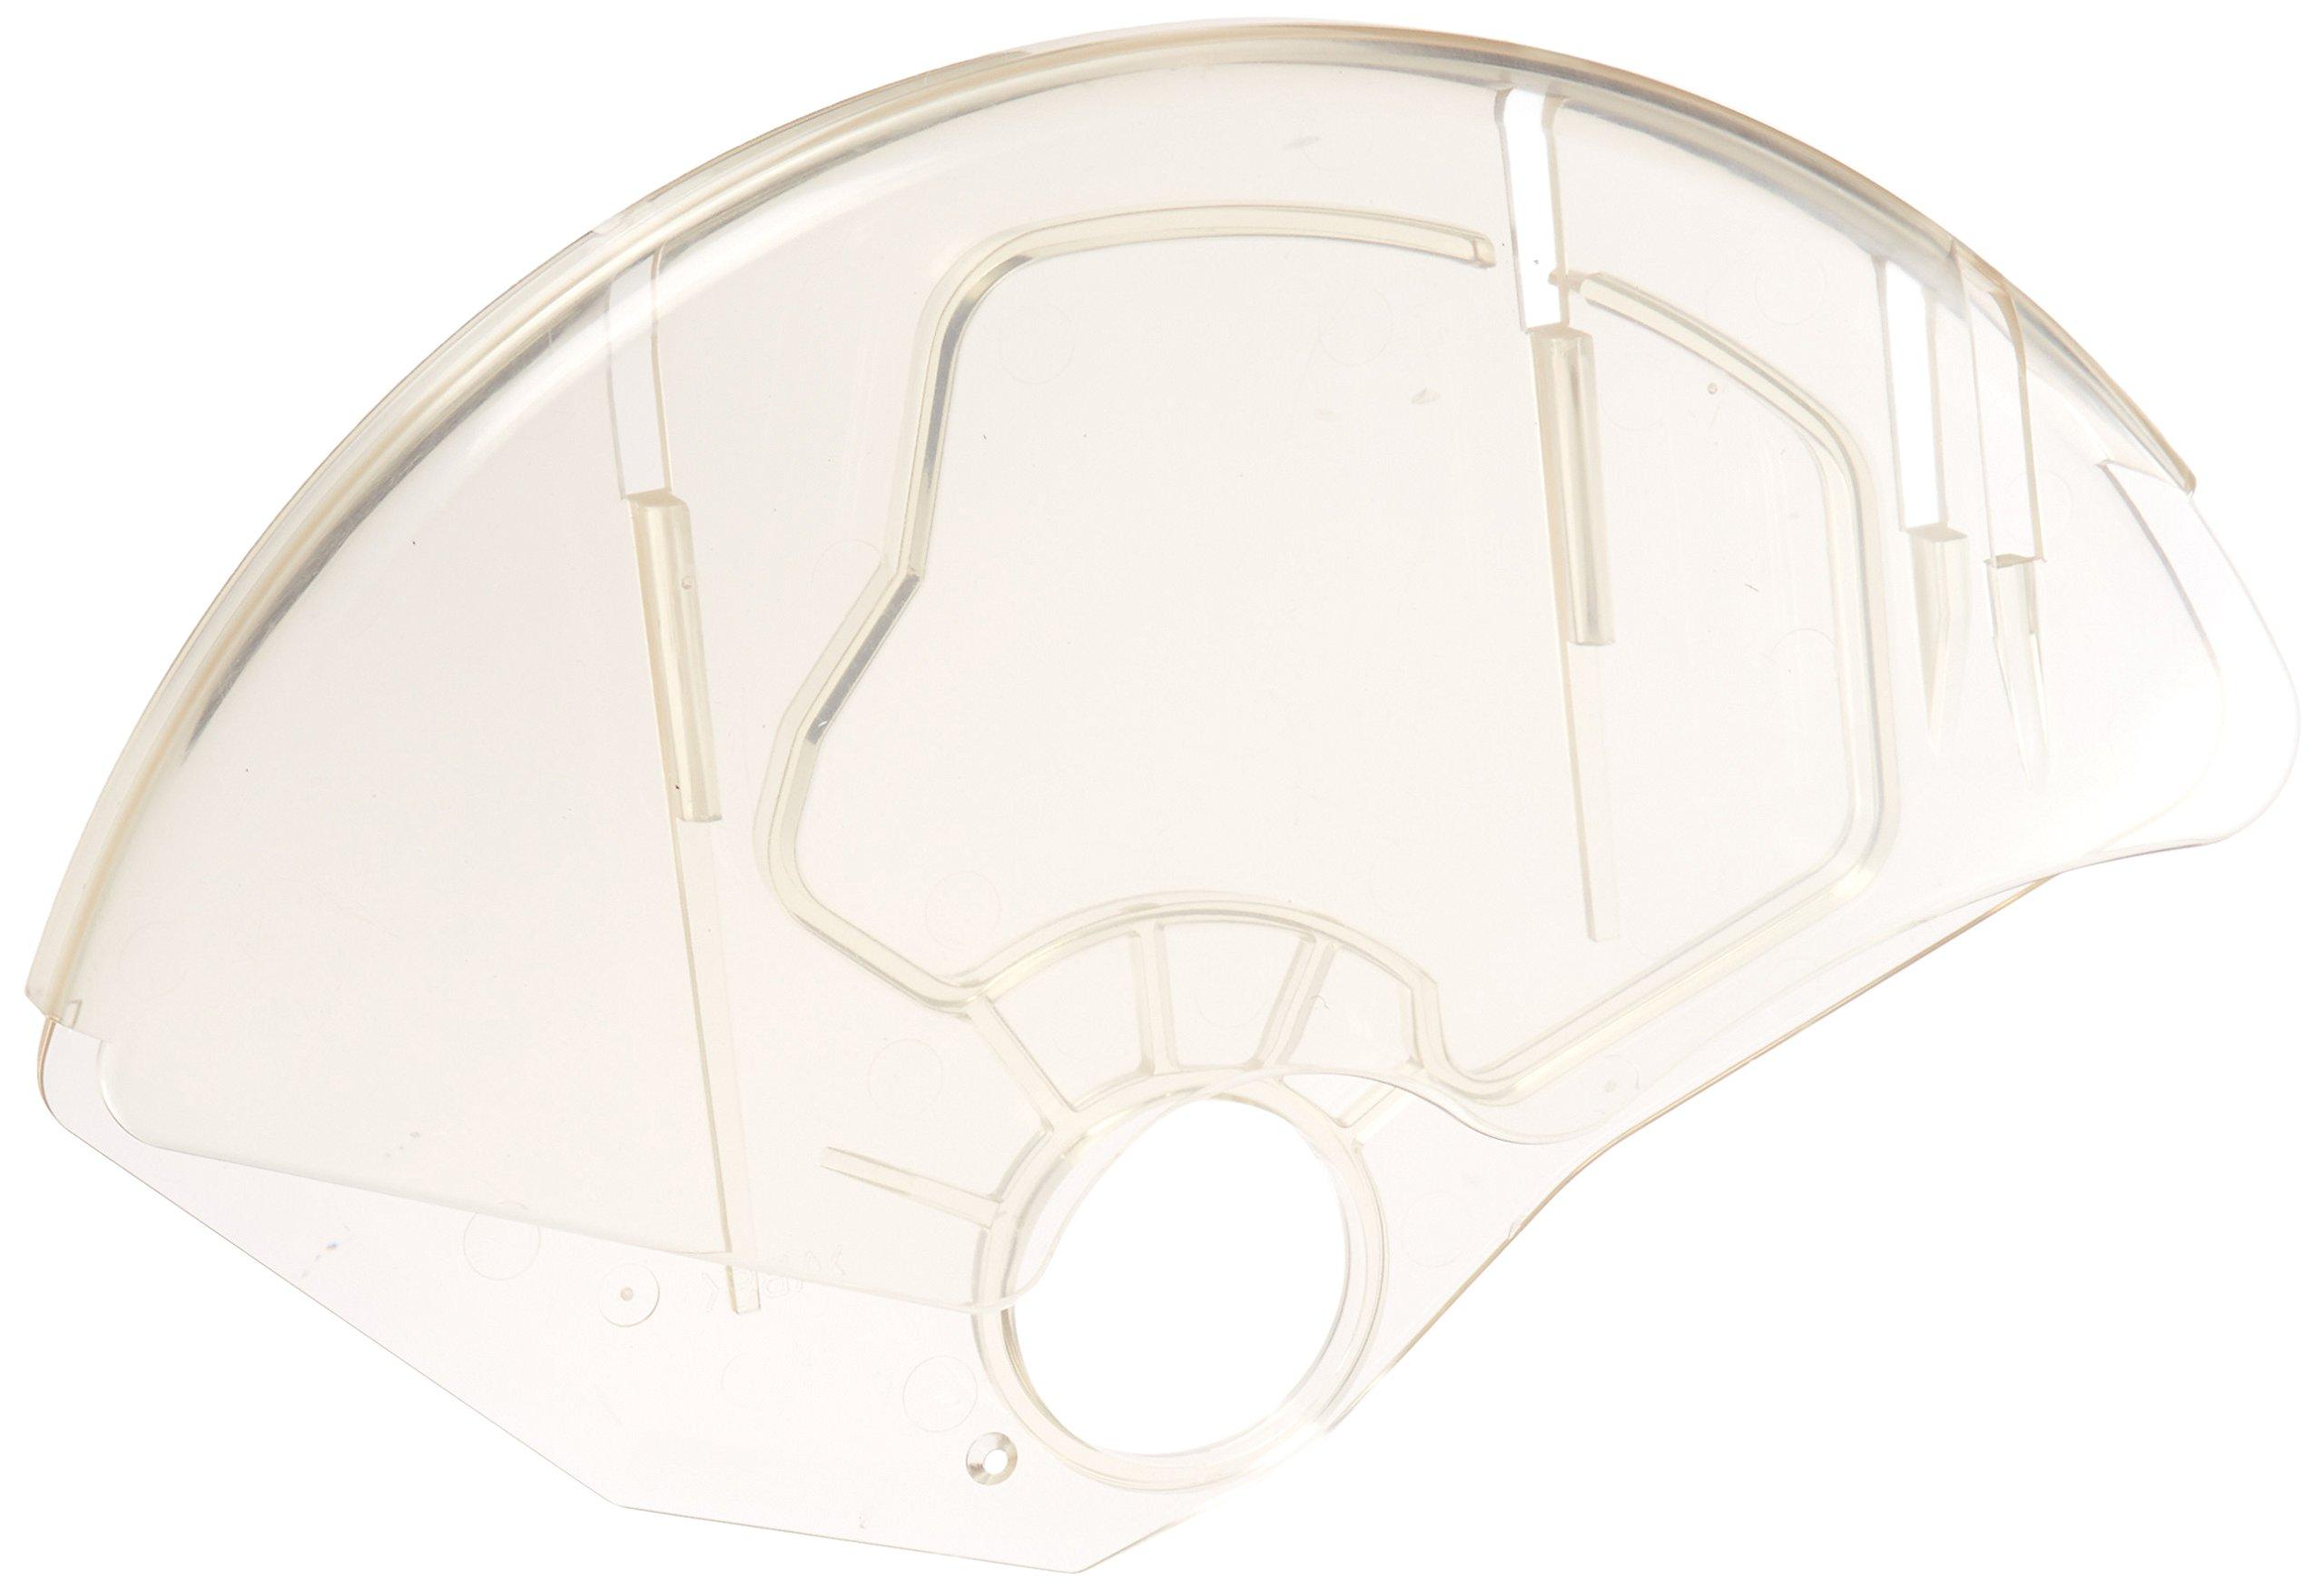 Hitachi 310724 Safety Cover C12Fsa Replacement Part